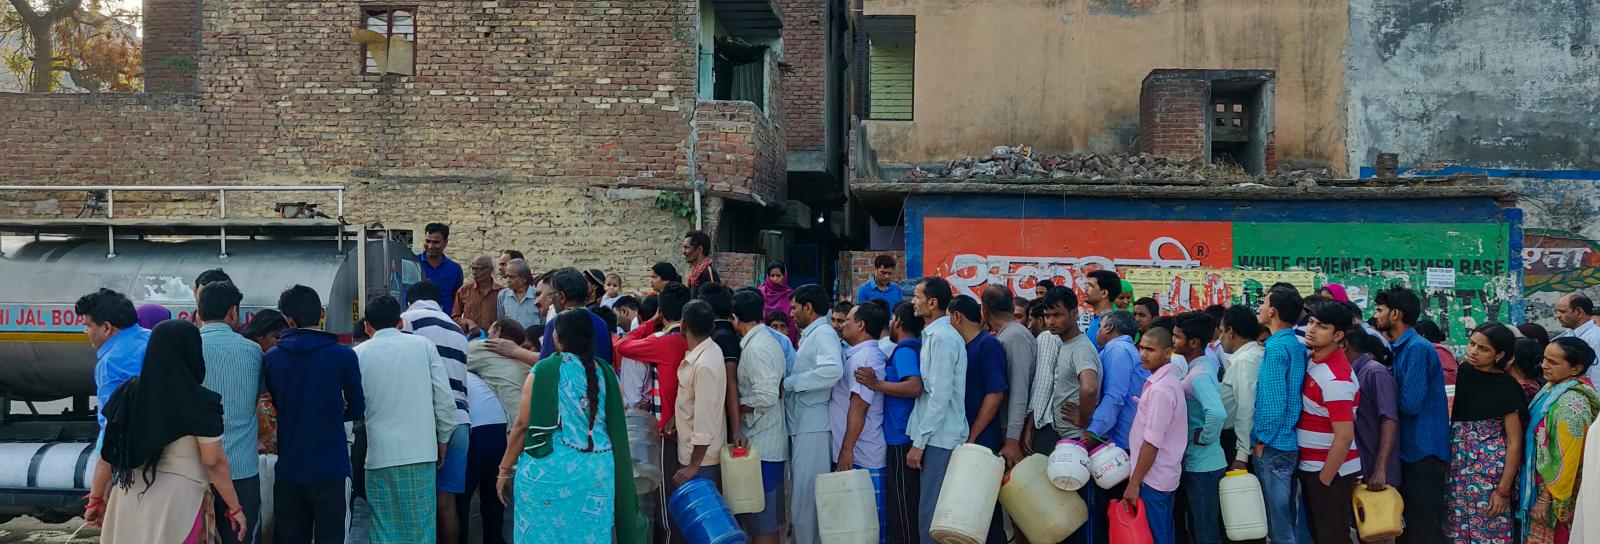 water queue in India